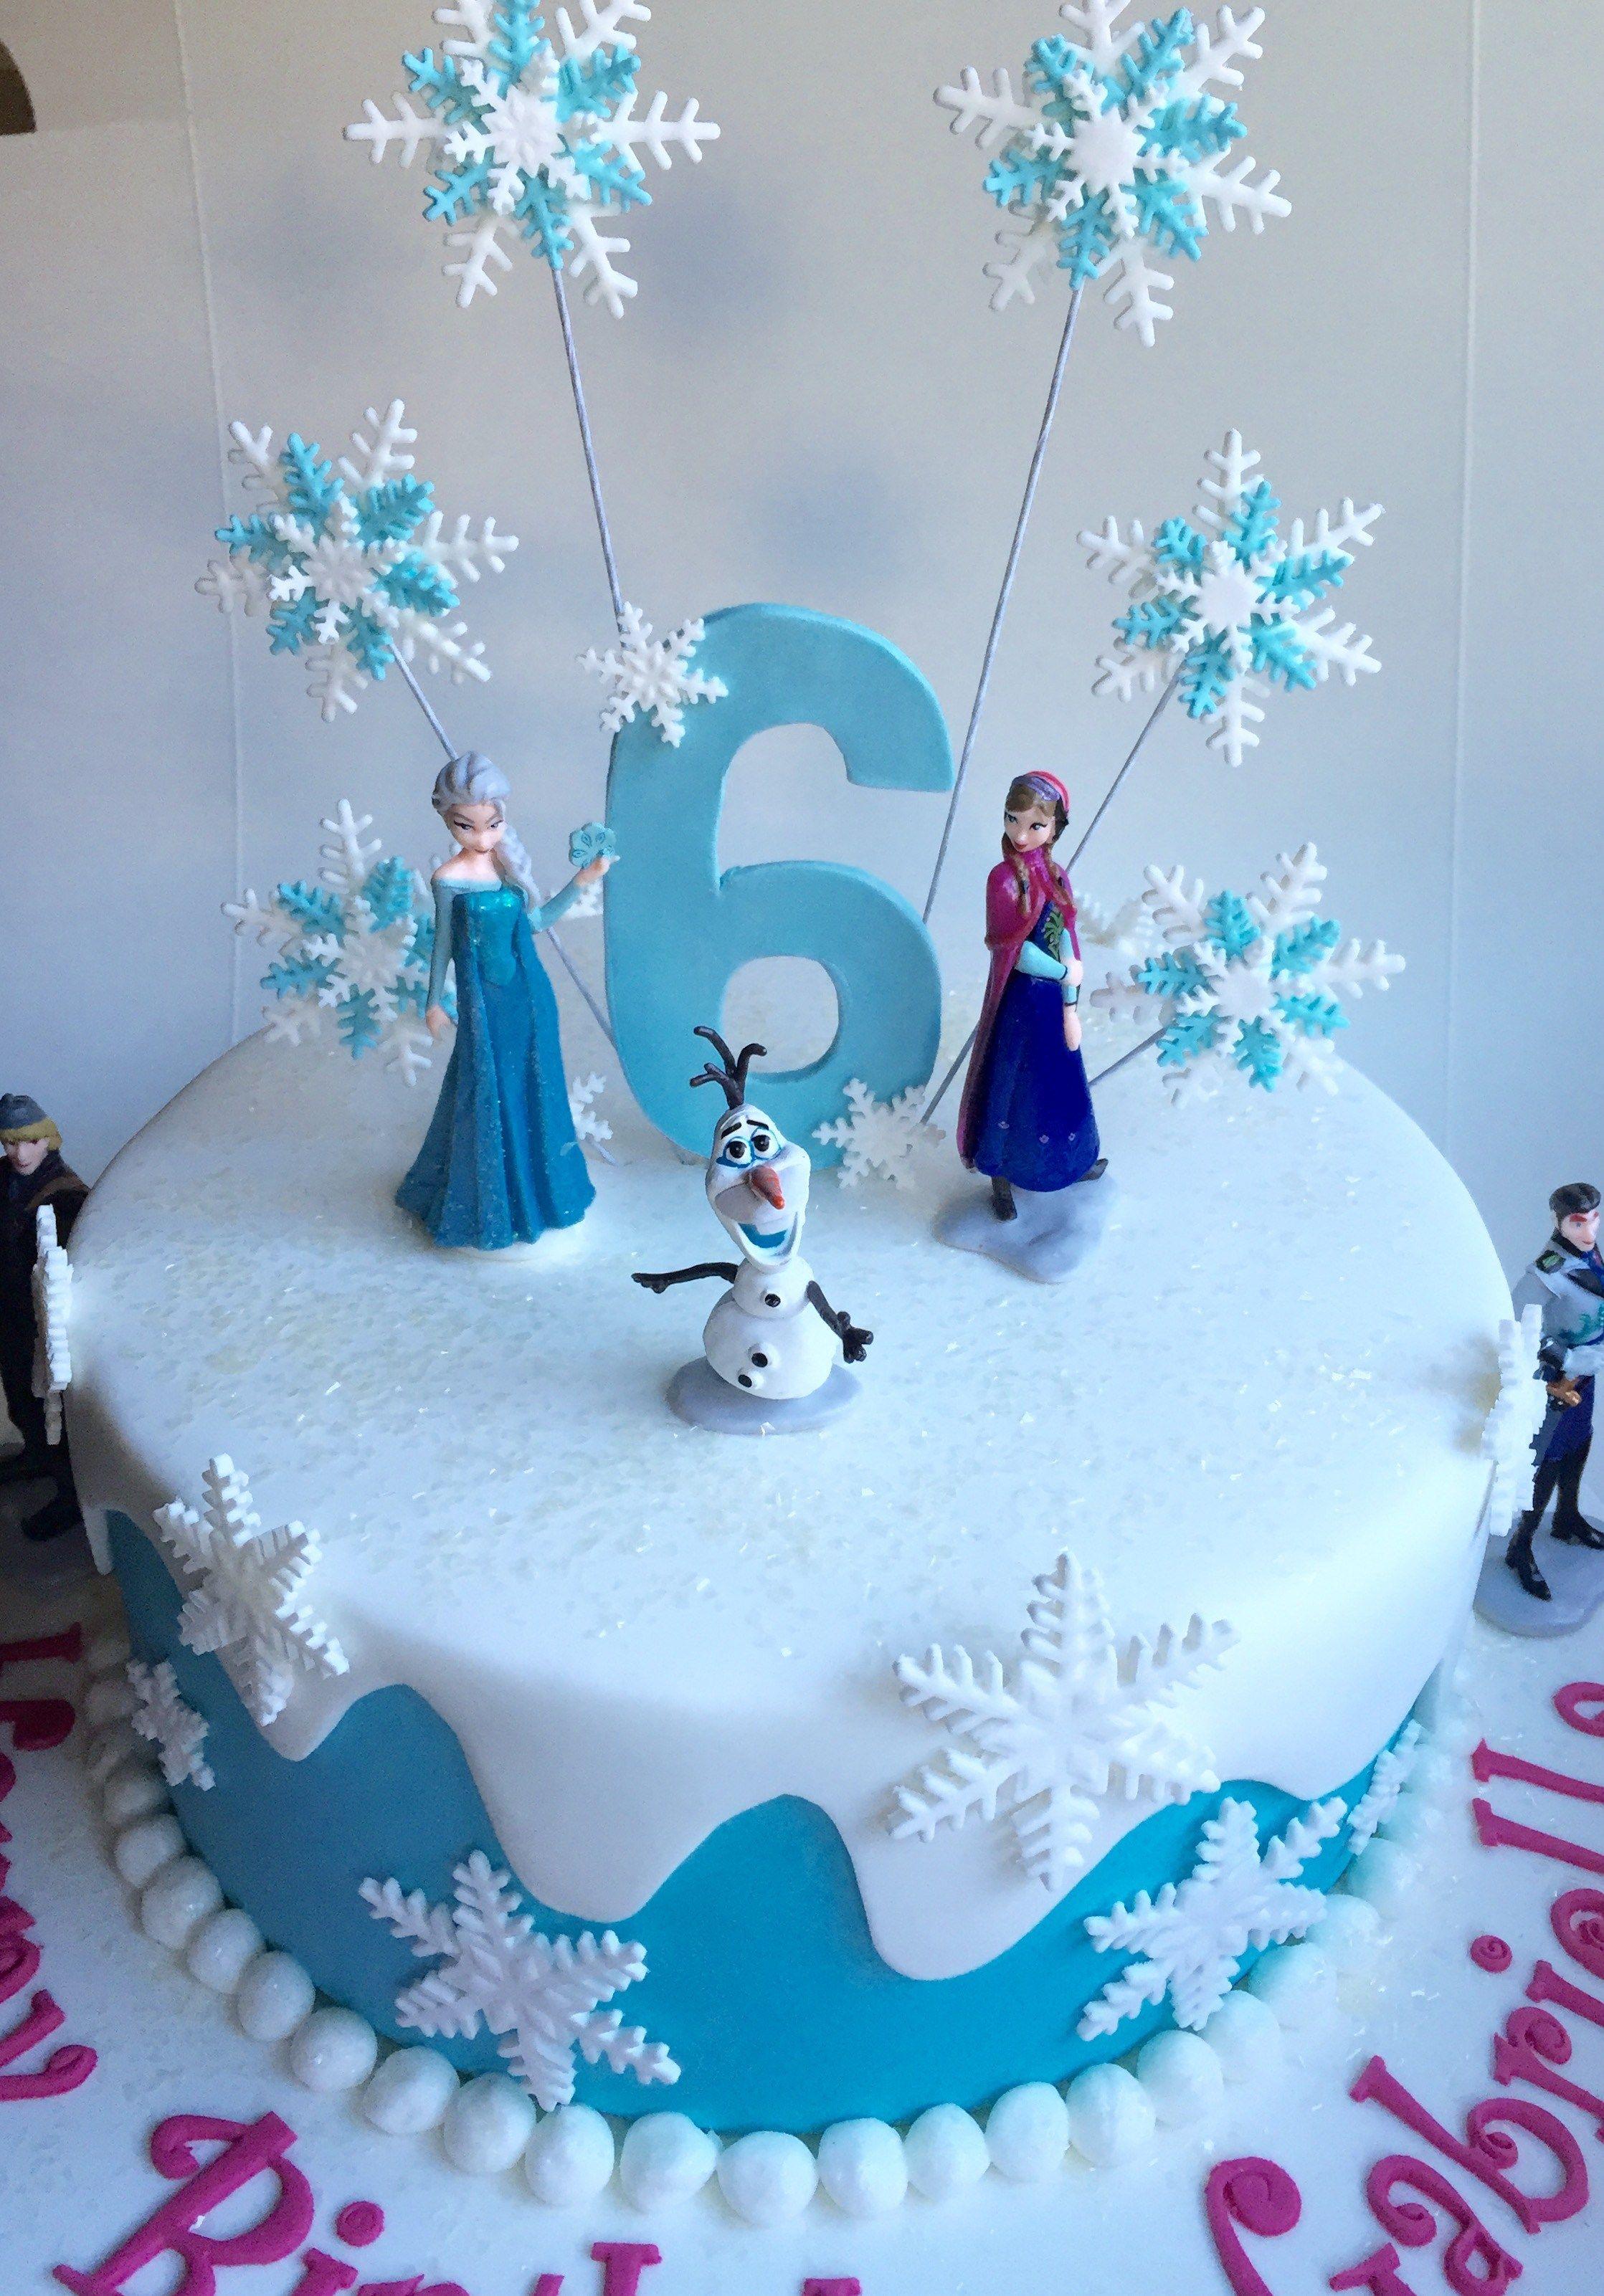 Tremendous 32 Elegant Image Of Frozen Birthday Cake Ideas Frozen Themed Birthday Cards Printable Benkemecafe Filternl